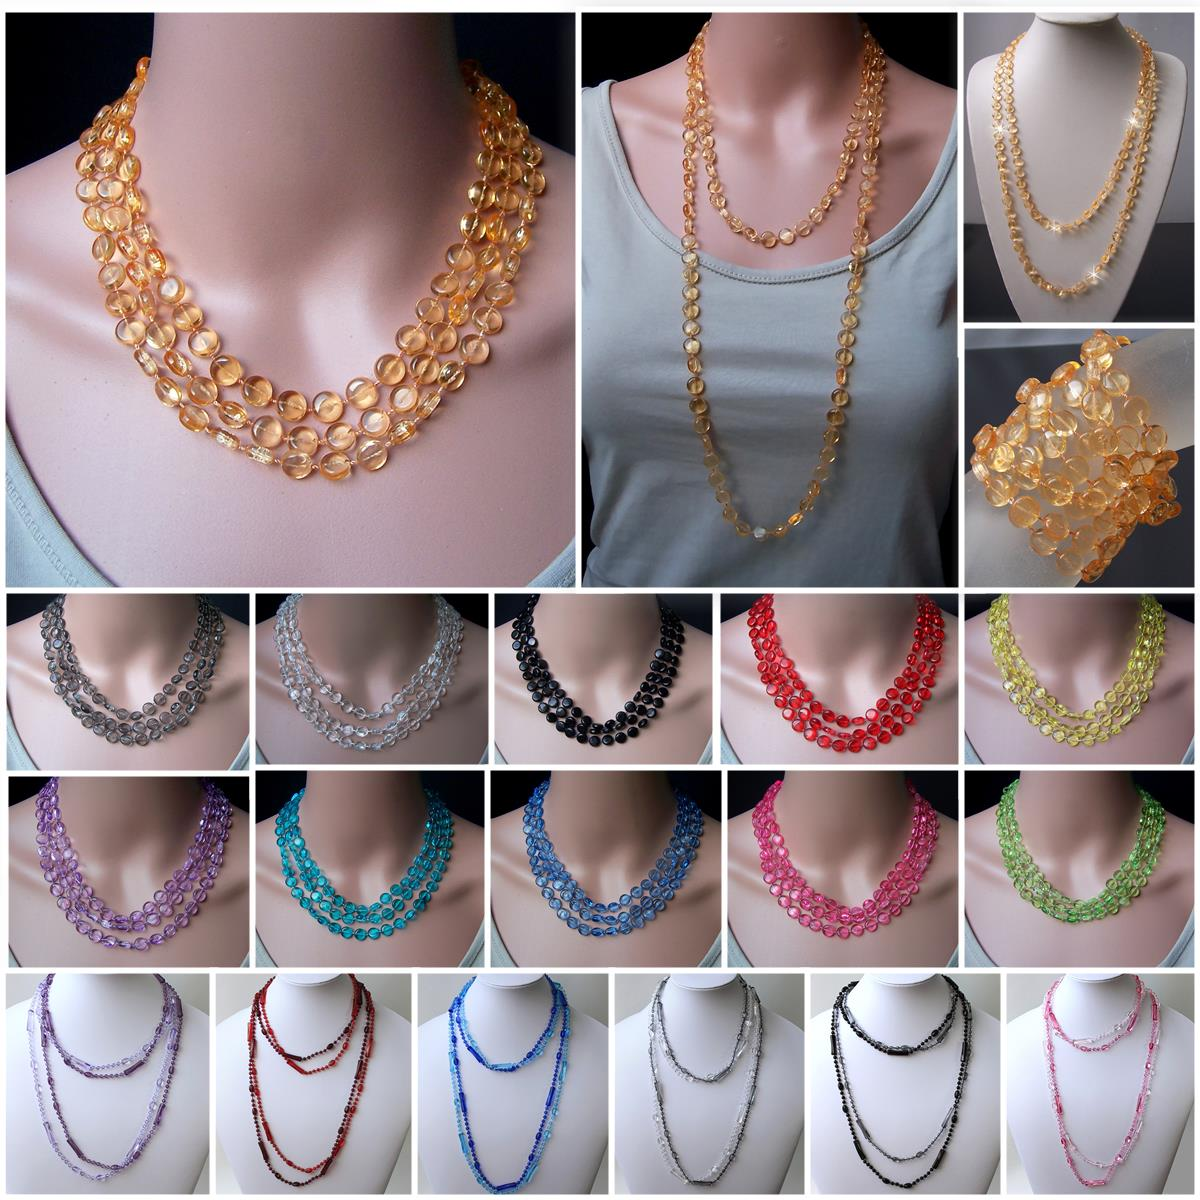 VZ6# Wickelkette Perlenkette Halskette transparente Perlen Modeschmuck